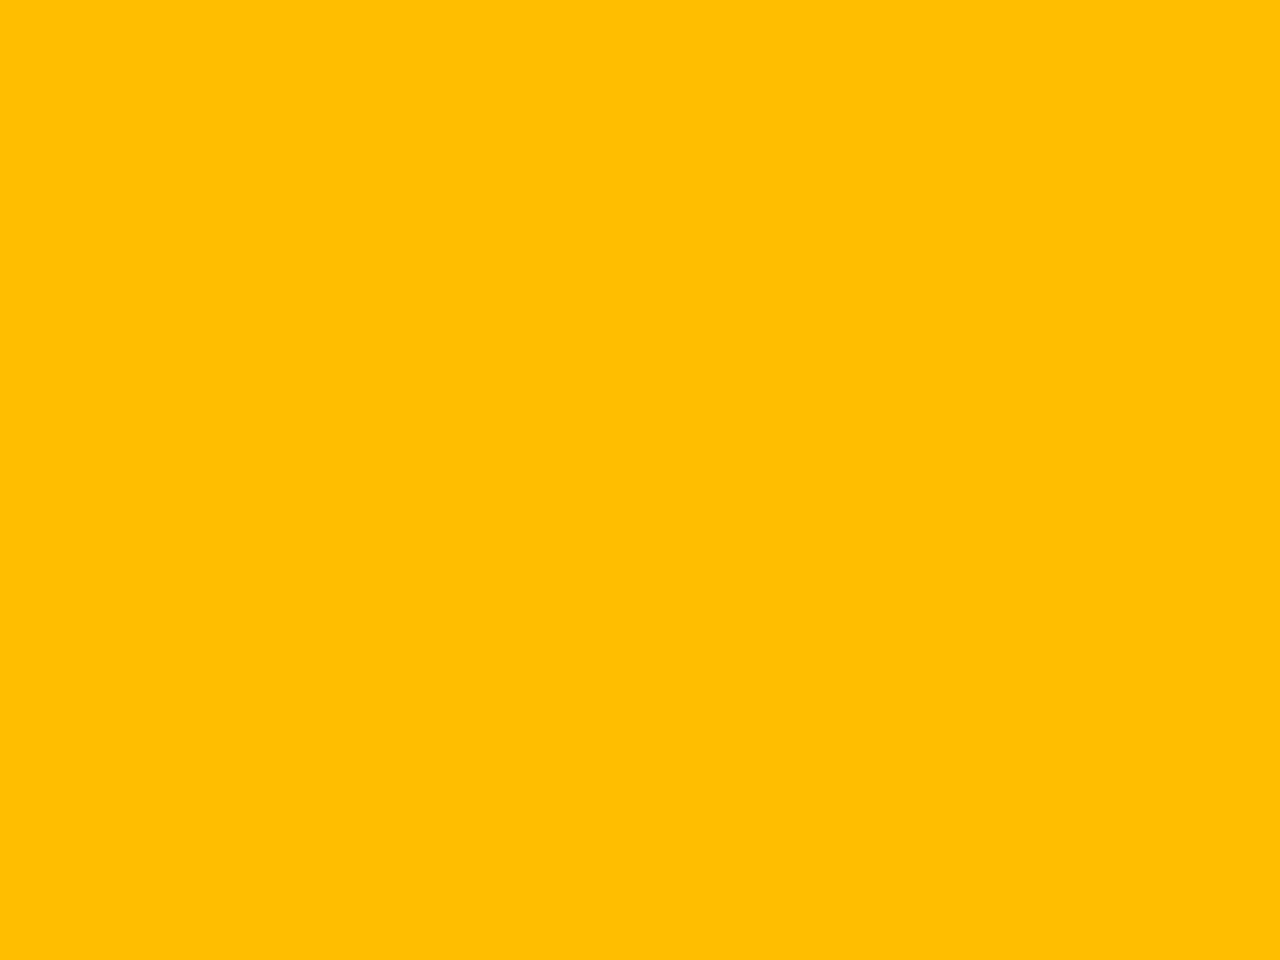 1280x960 Fluorescent Orange Solid Color Background